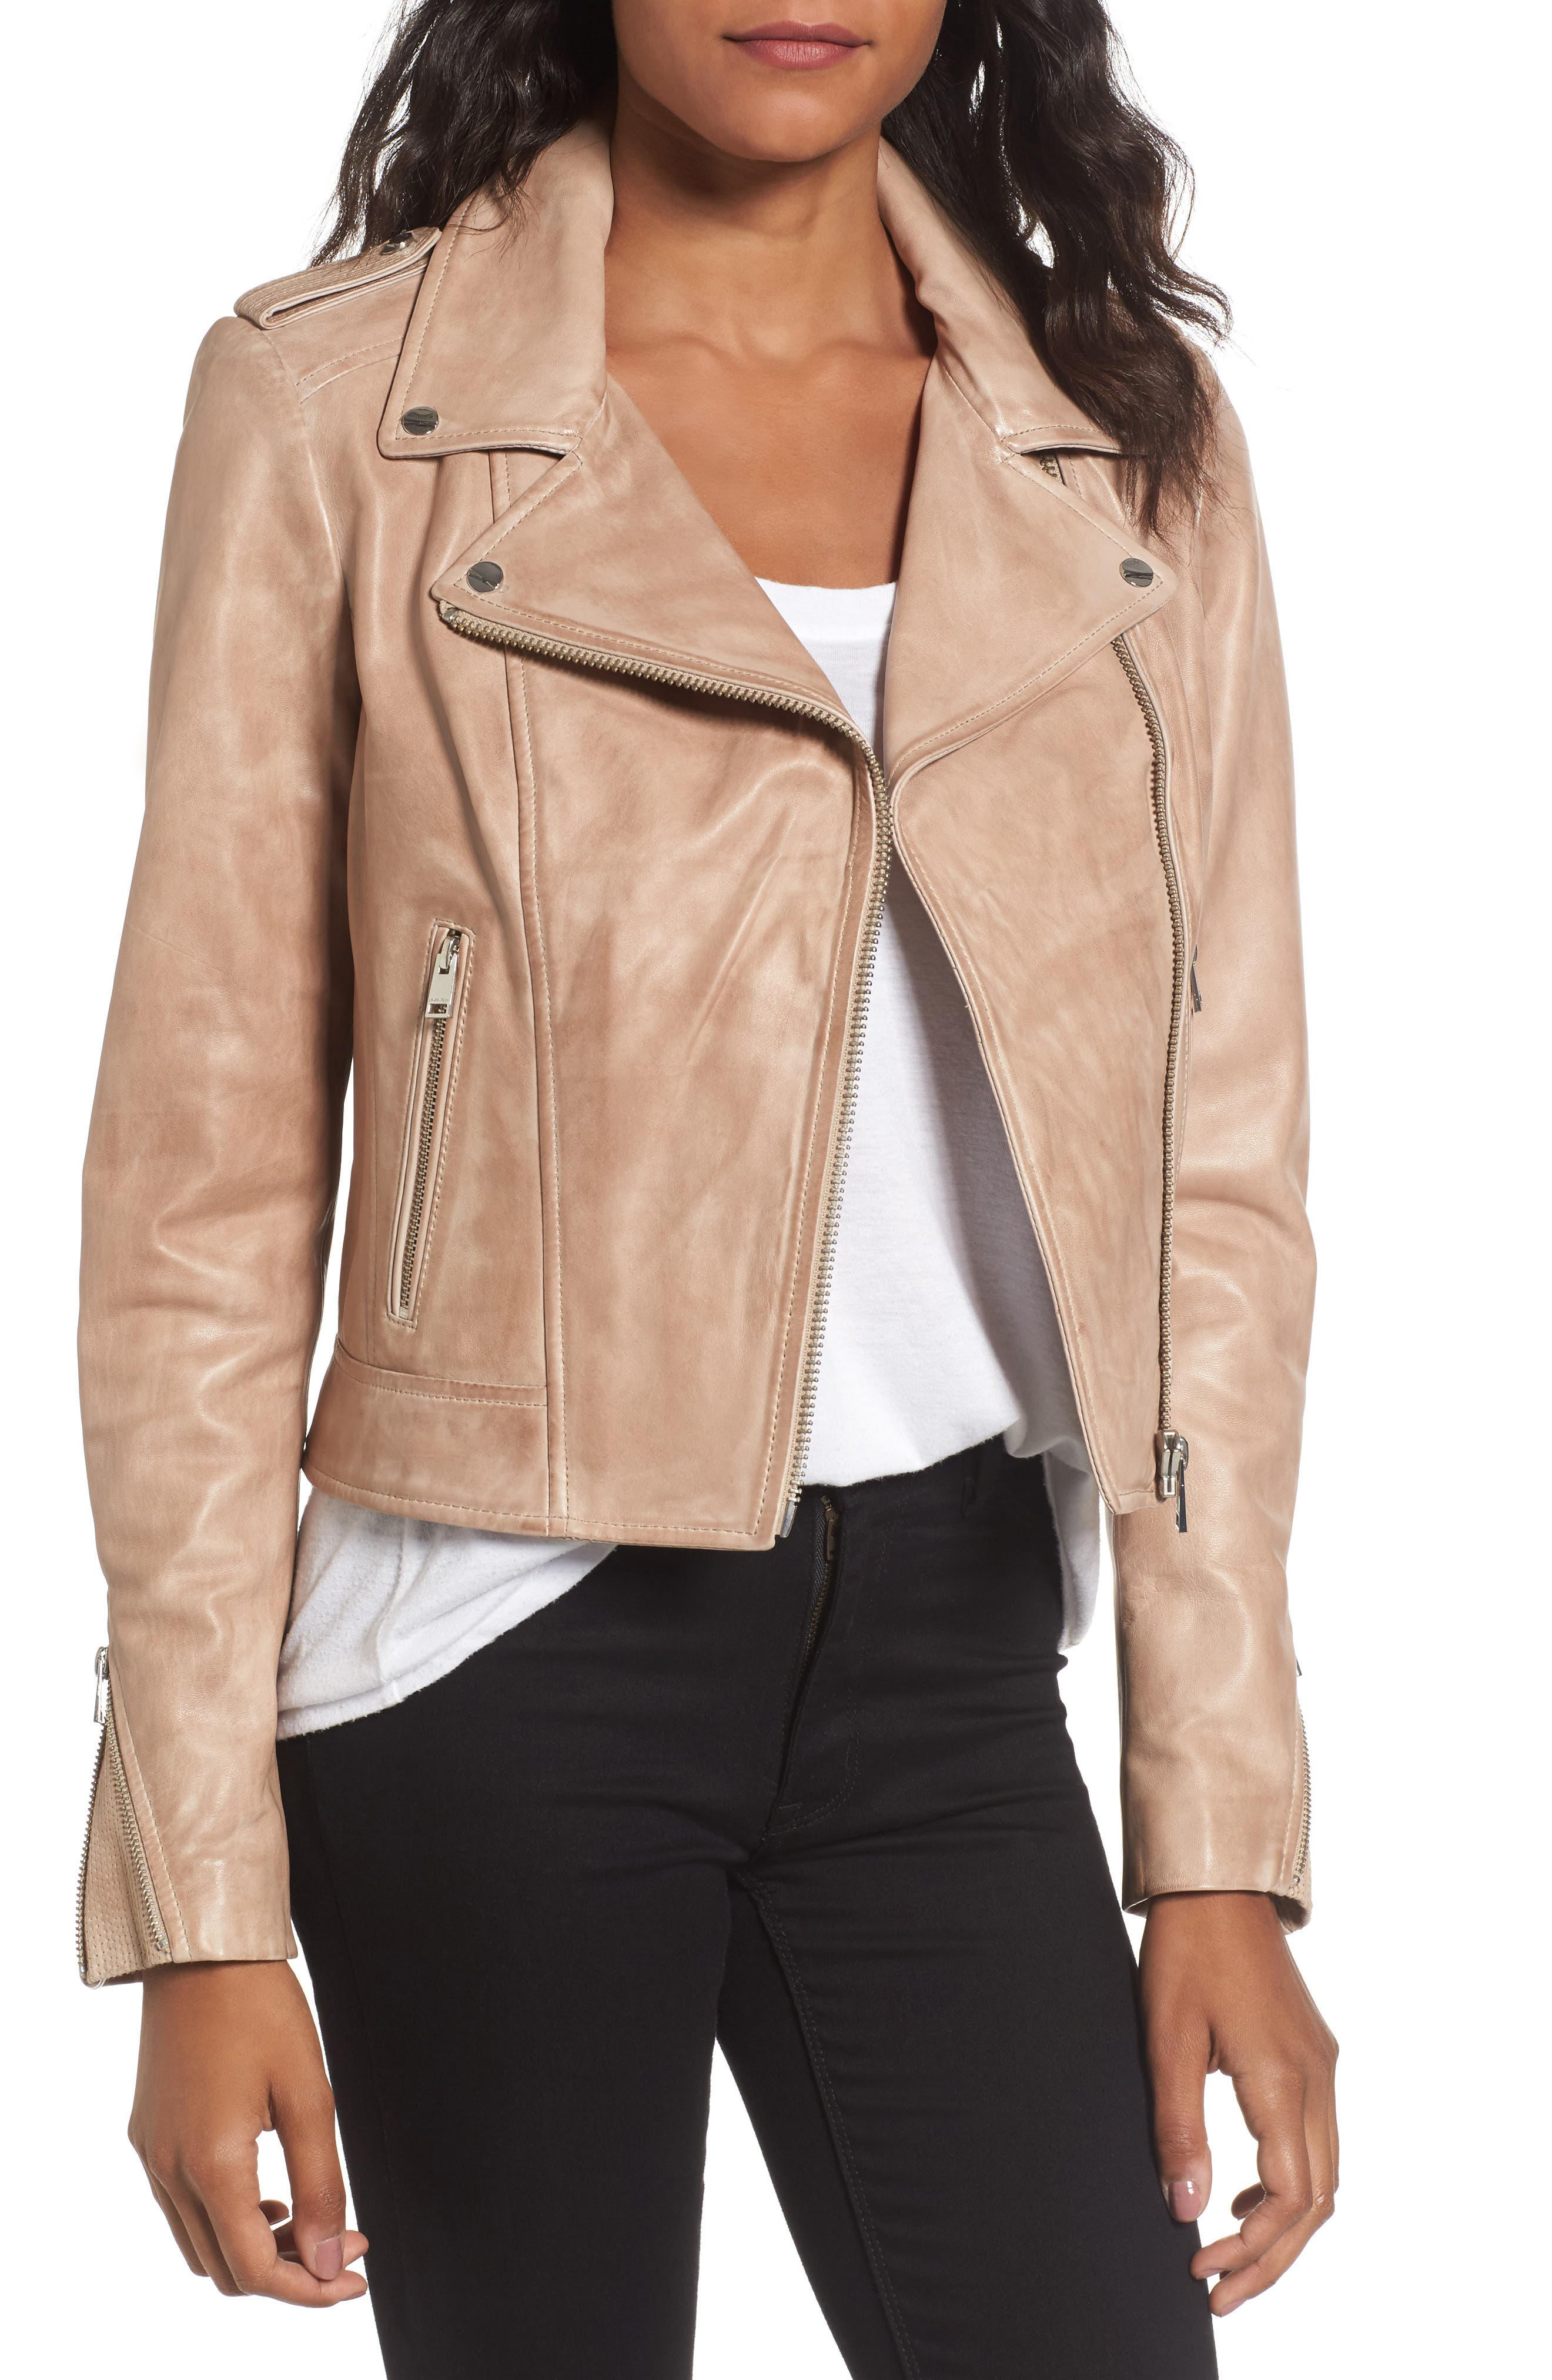 Donna Lambskin Leather Moto Jacket,                             Main thumbnail 1, color,                             253